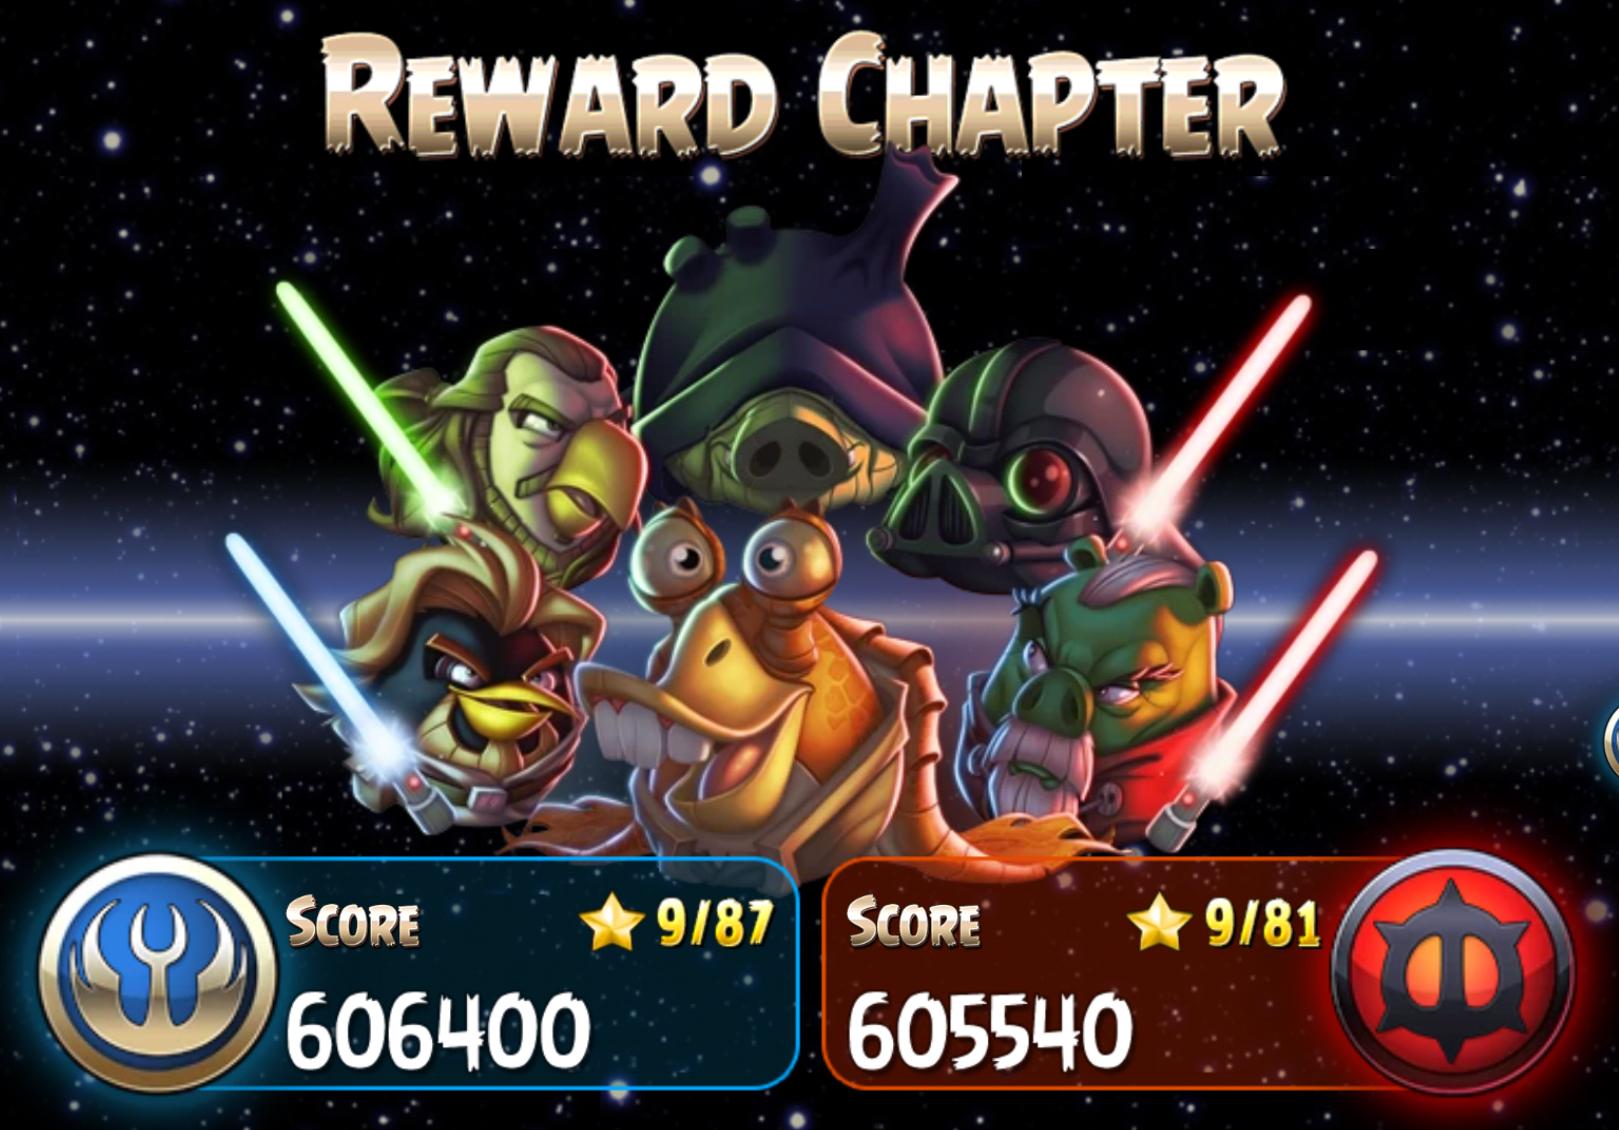 File:Reward chapter.jpg